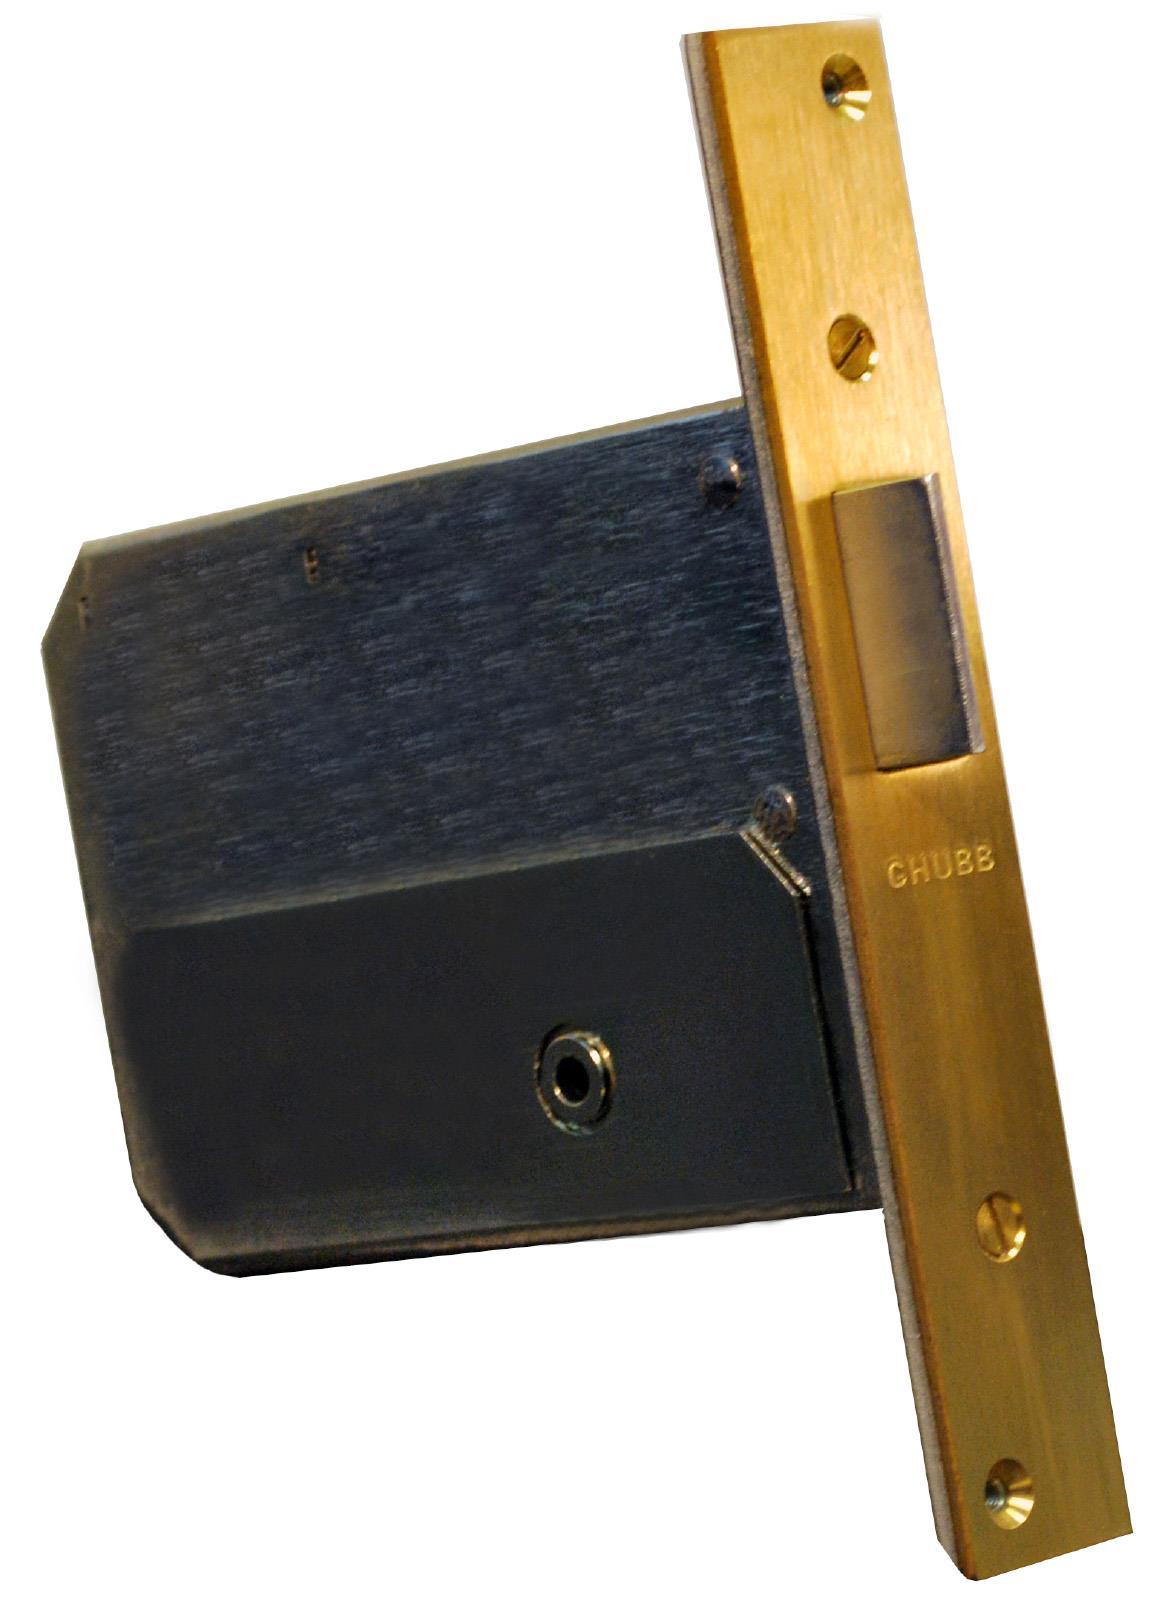 3R47 - Morticed Latch Lock